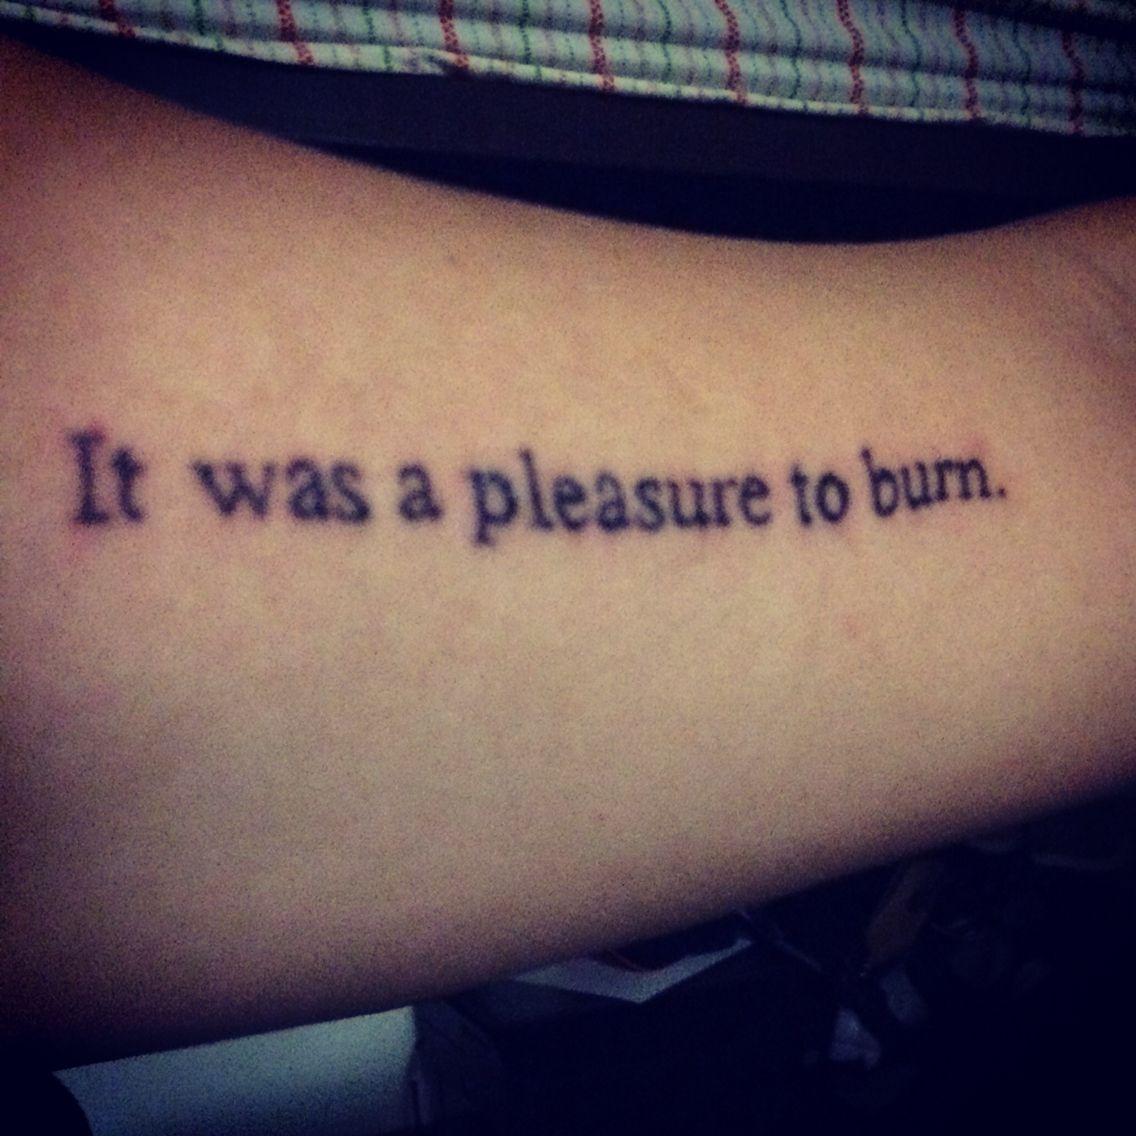 First sentence of fahrenheit 451 ray bradbury it was a for Fahrenheit 451 tattoo